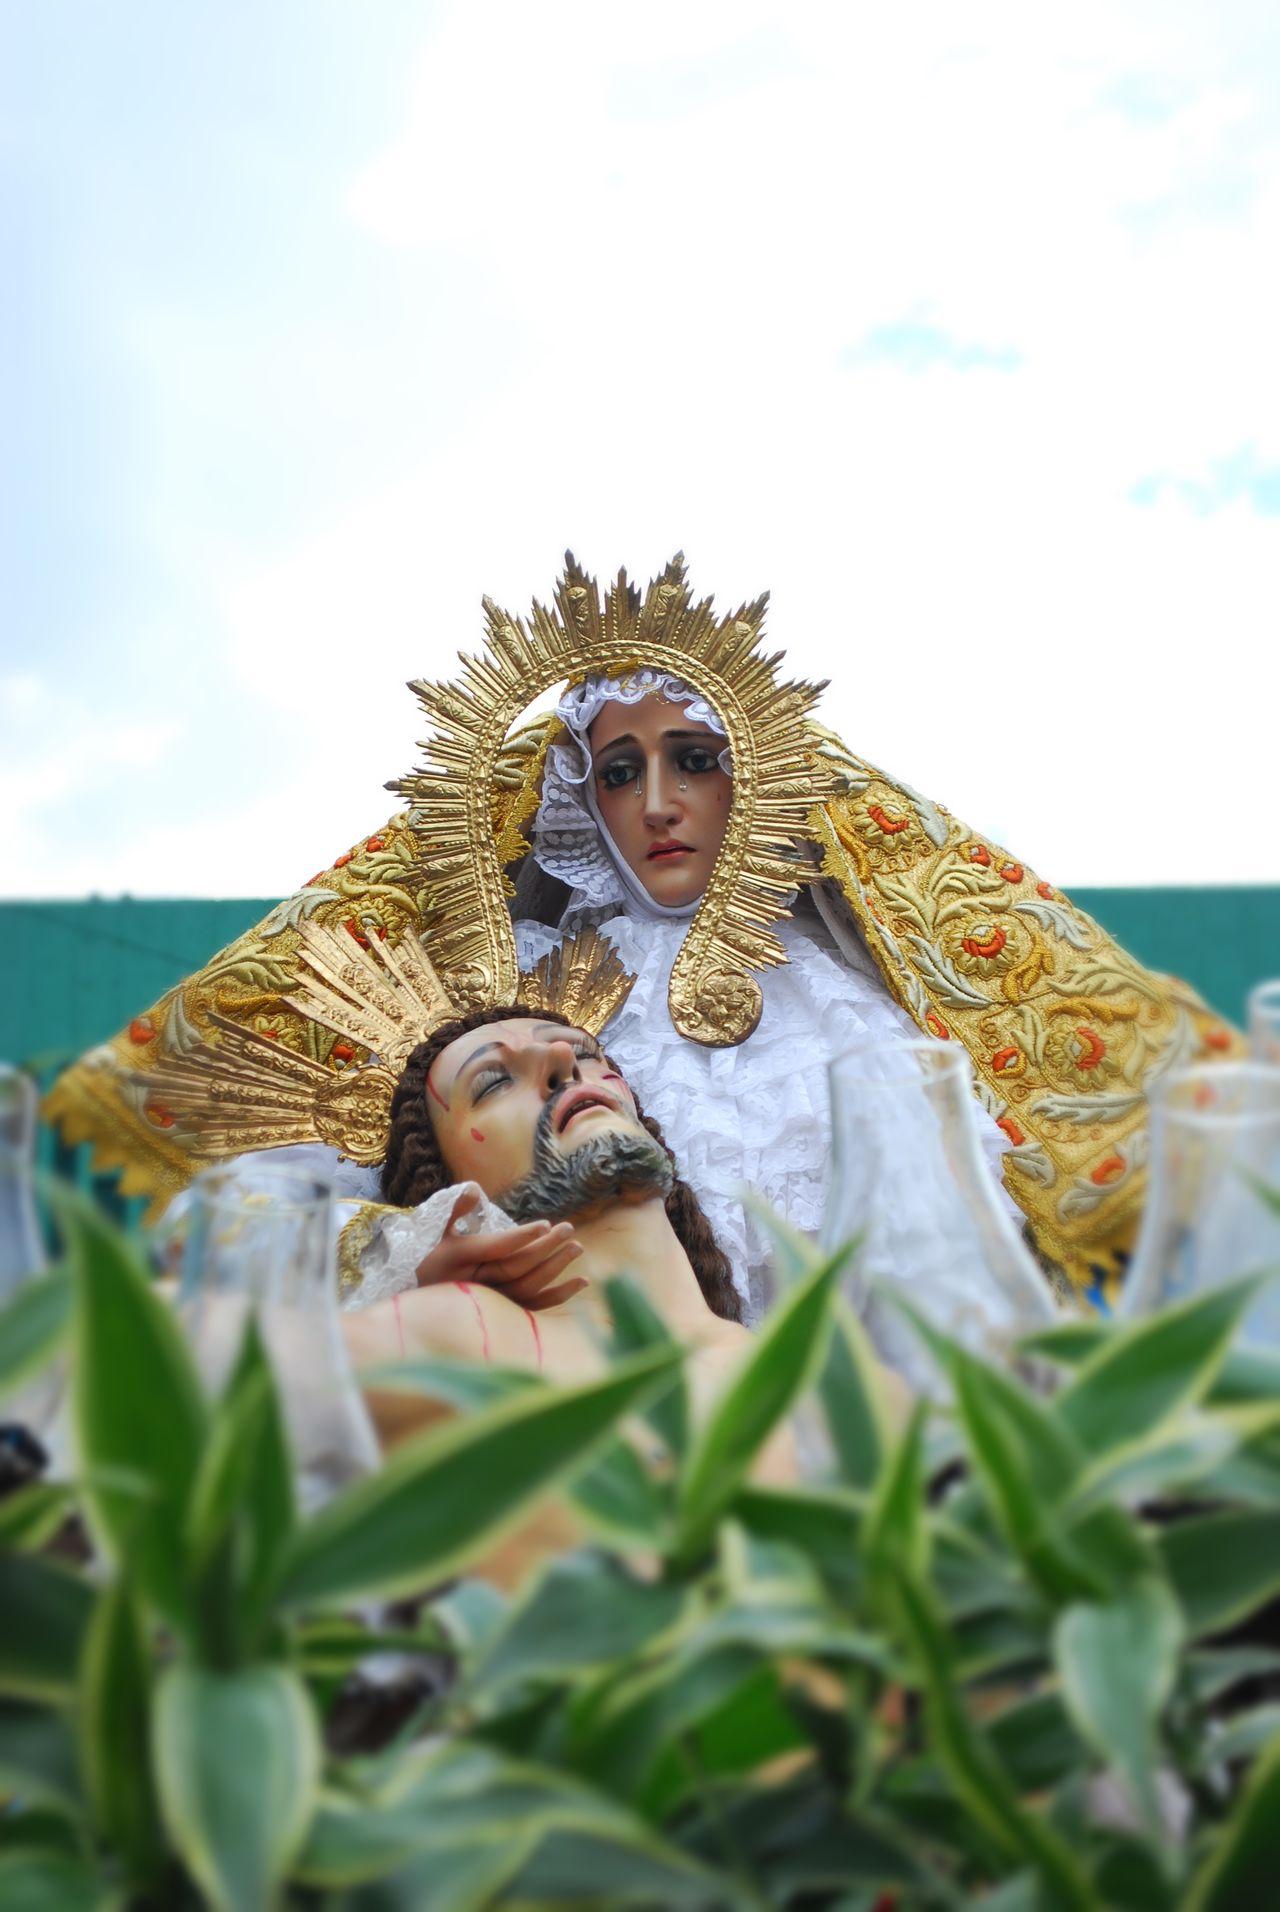 Belief Cultures Holy Week Lentenseason Philippines Religion Sculpture Tradition